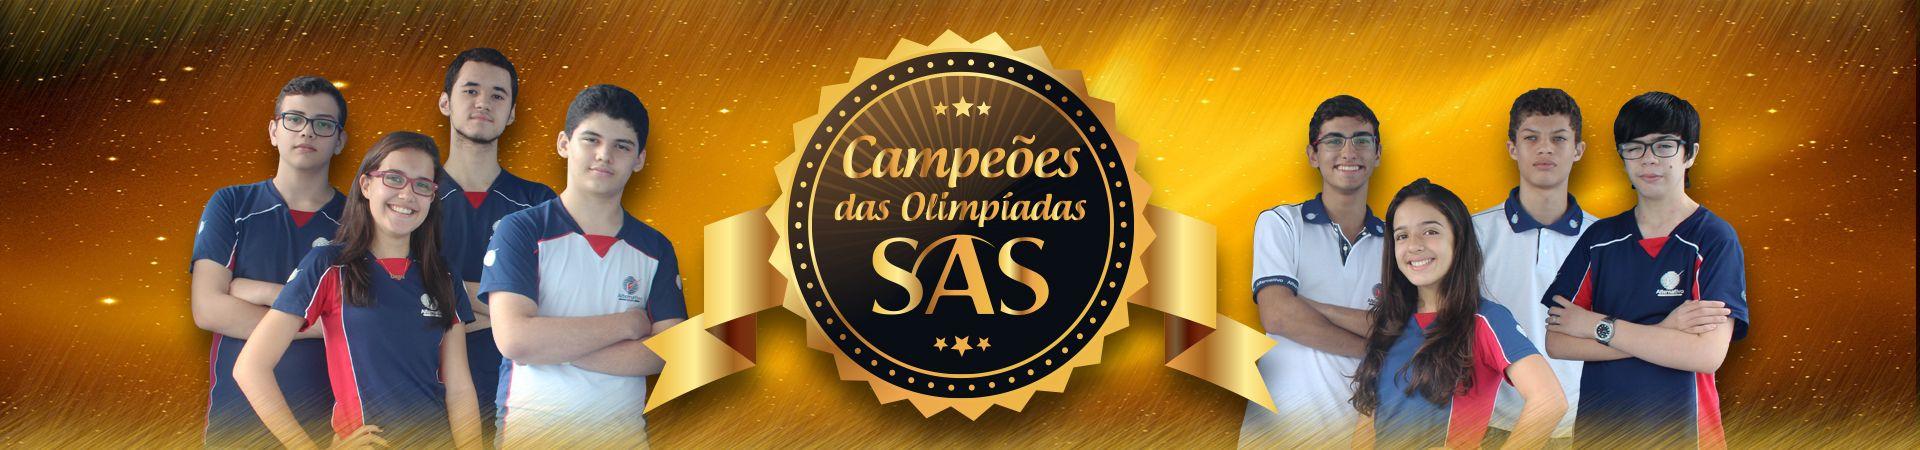 Campeões SAS